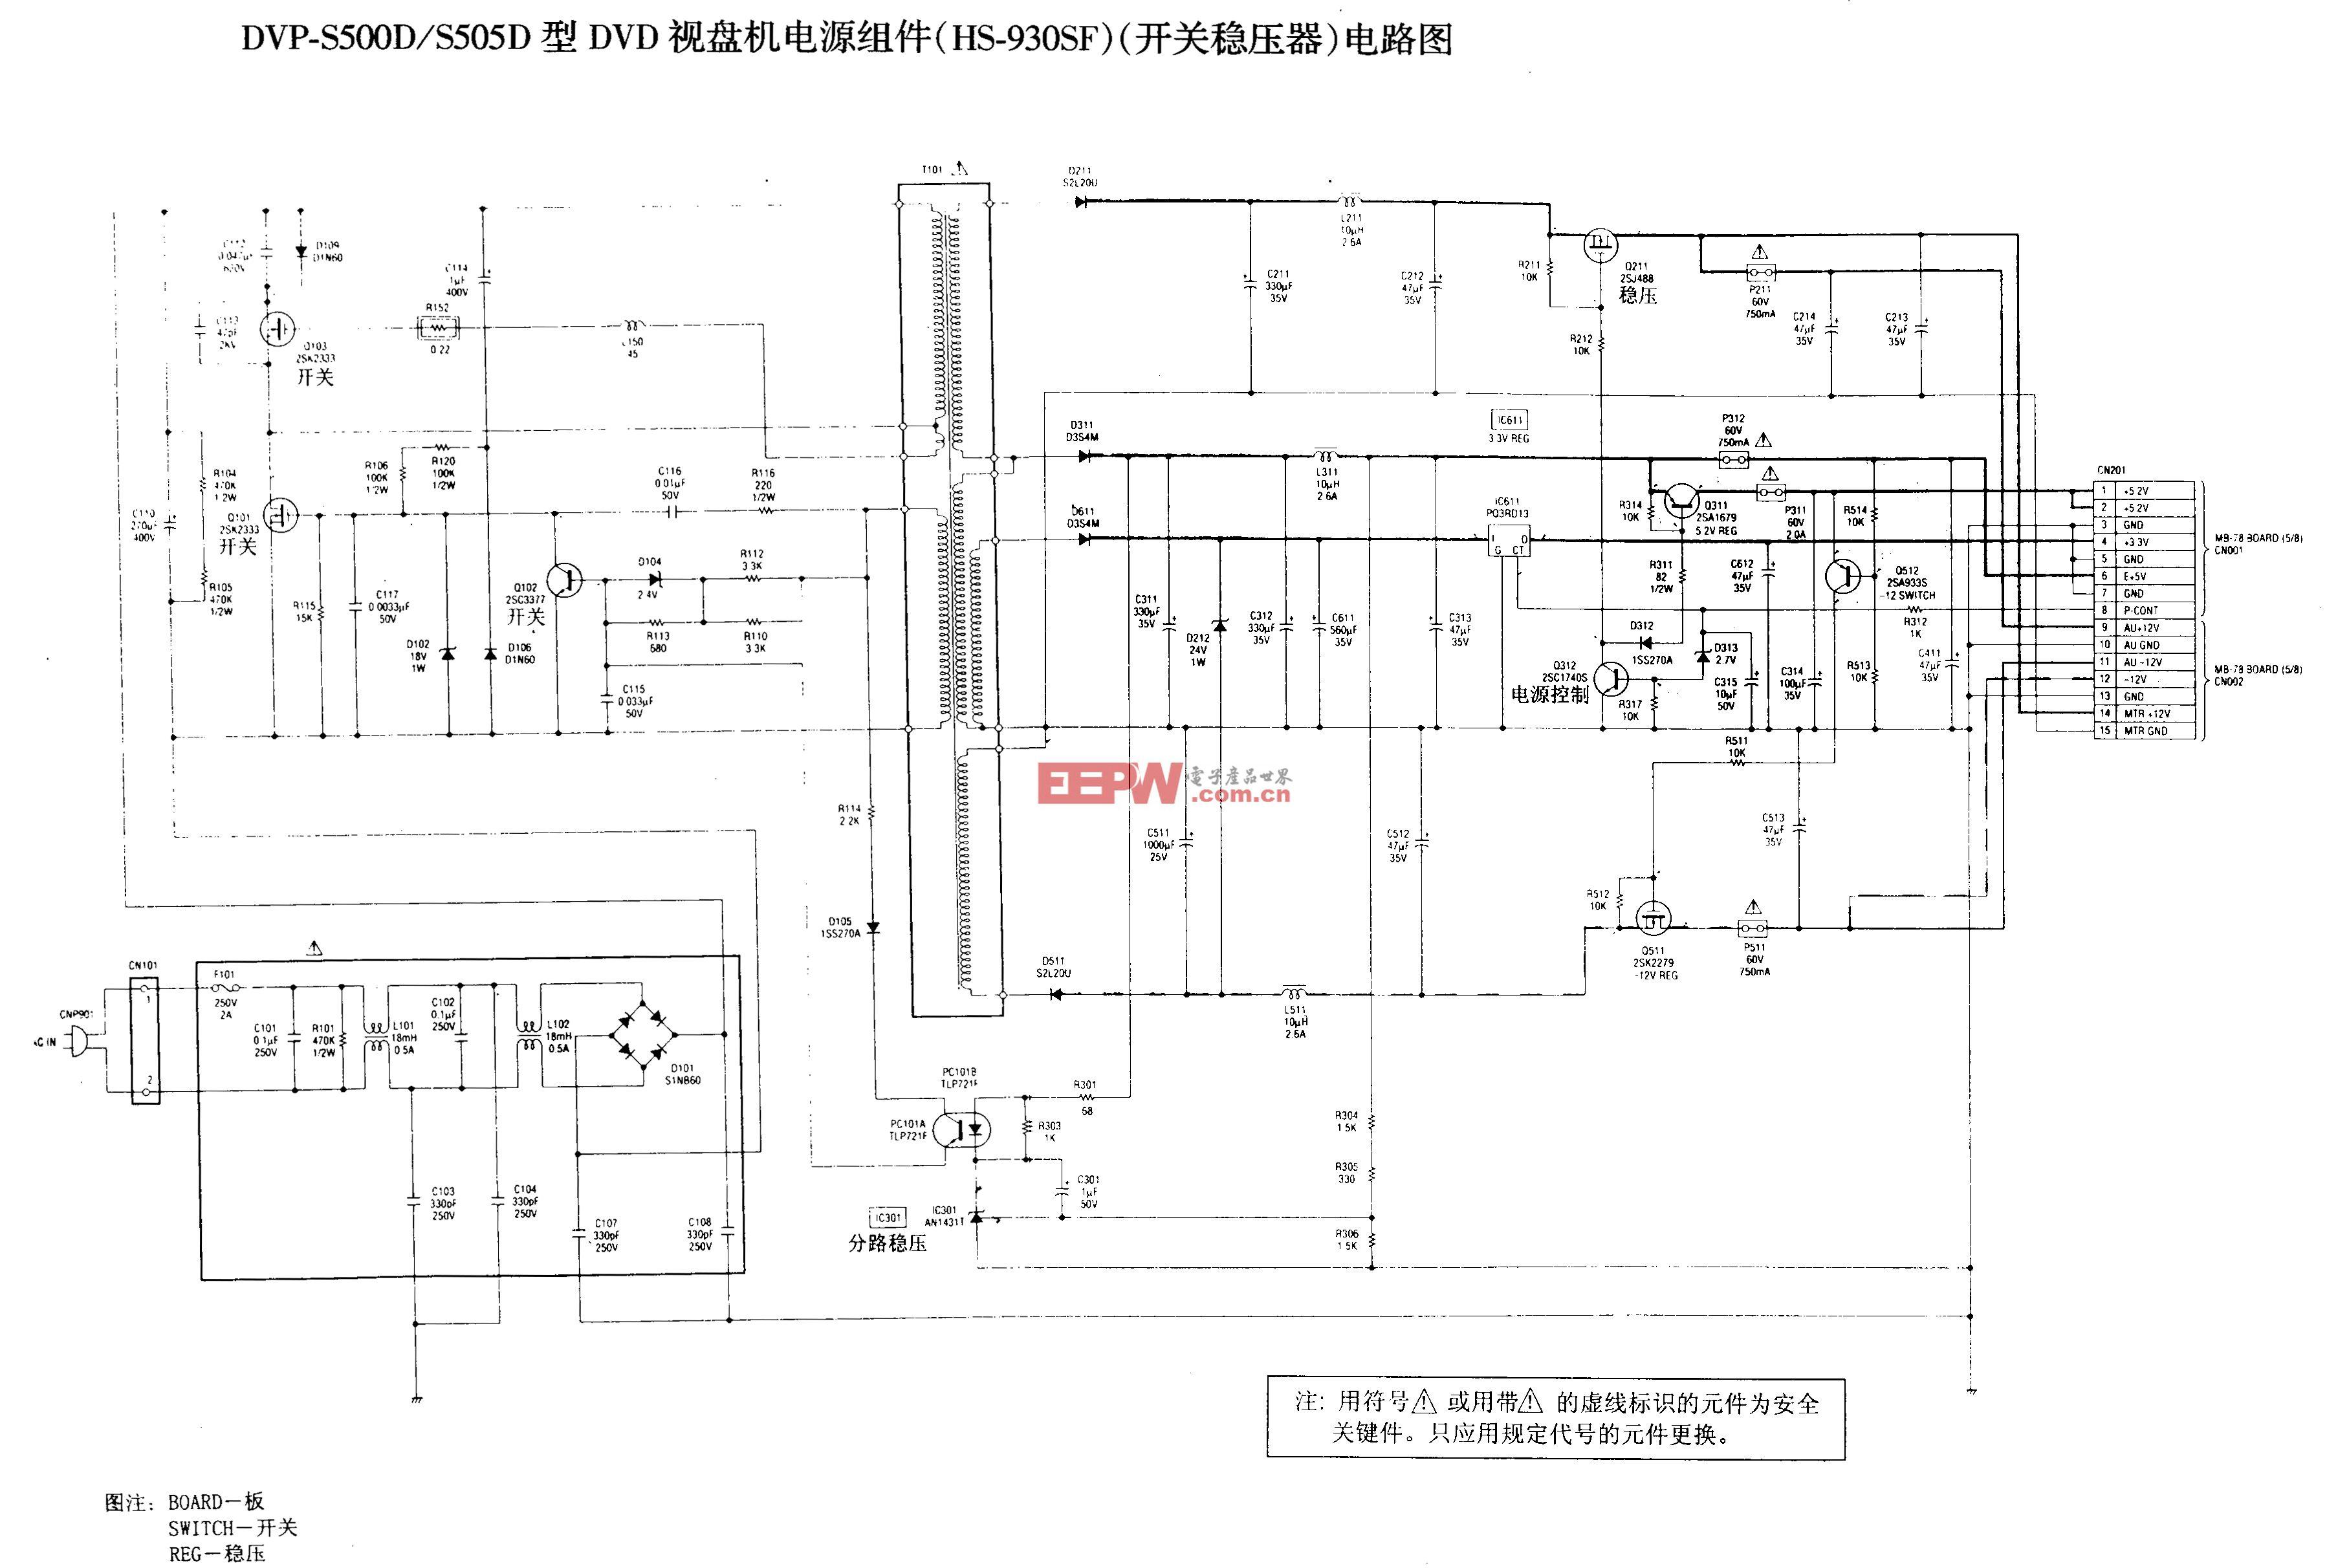 SONY DVP-S500D/S505D型DVD-RF,伺服,电源电路图A